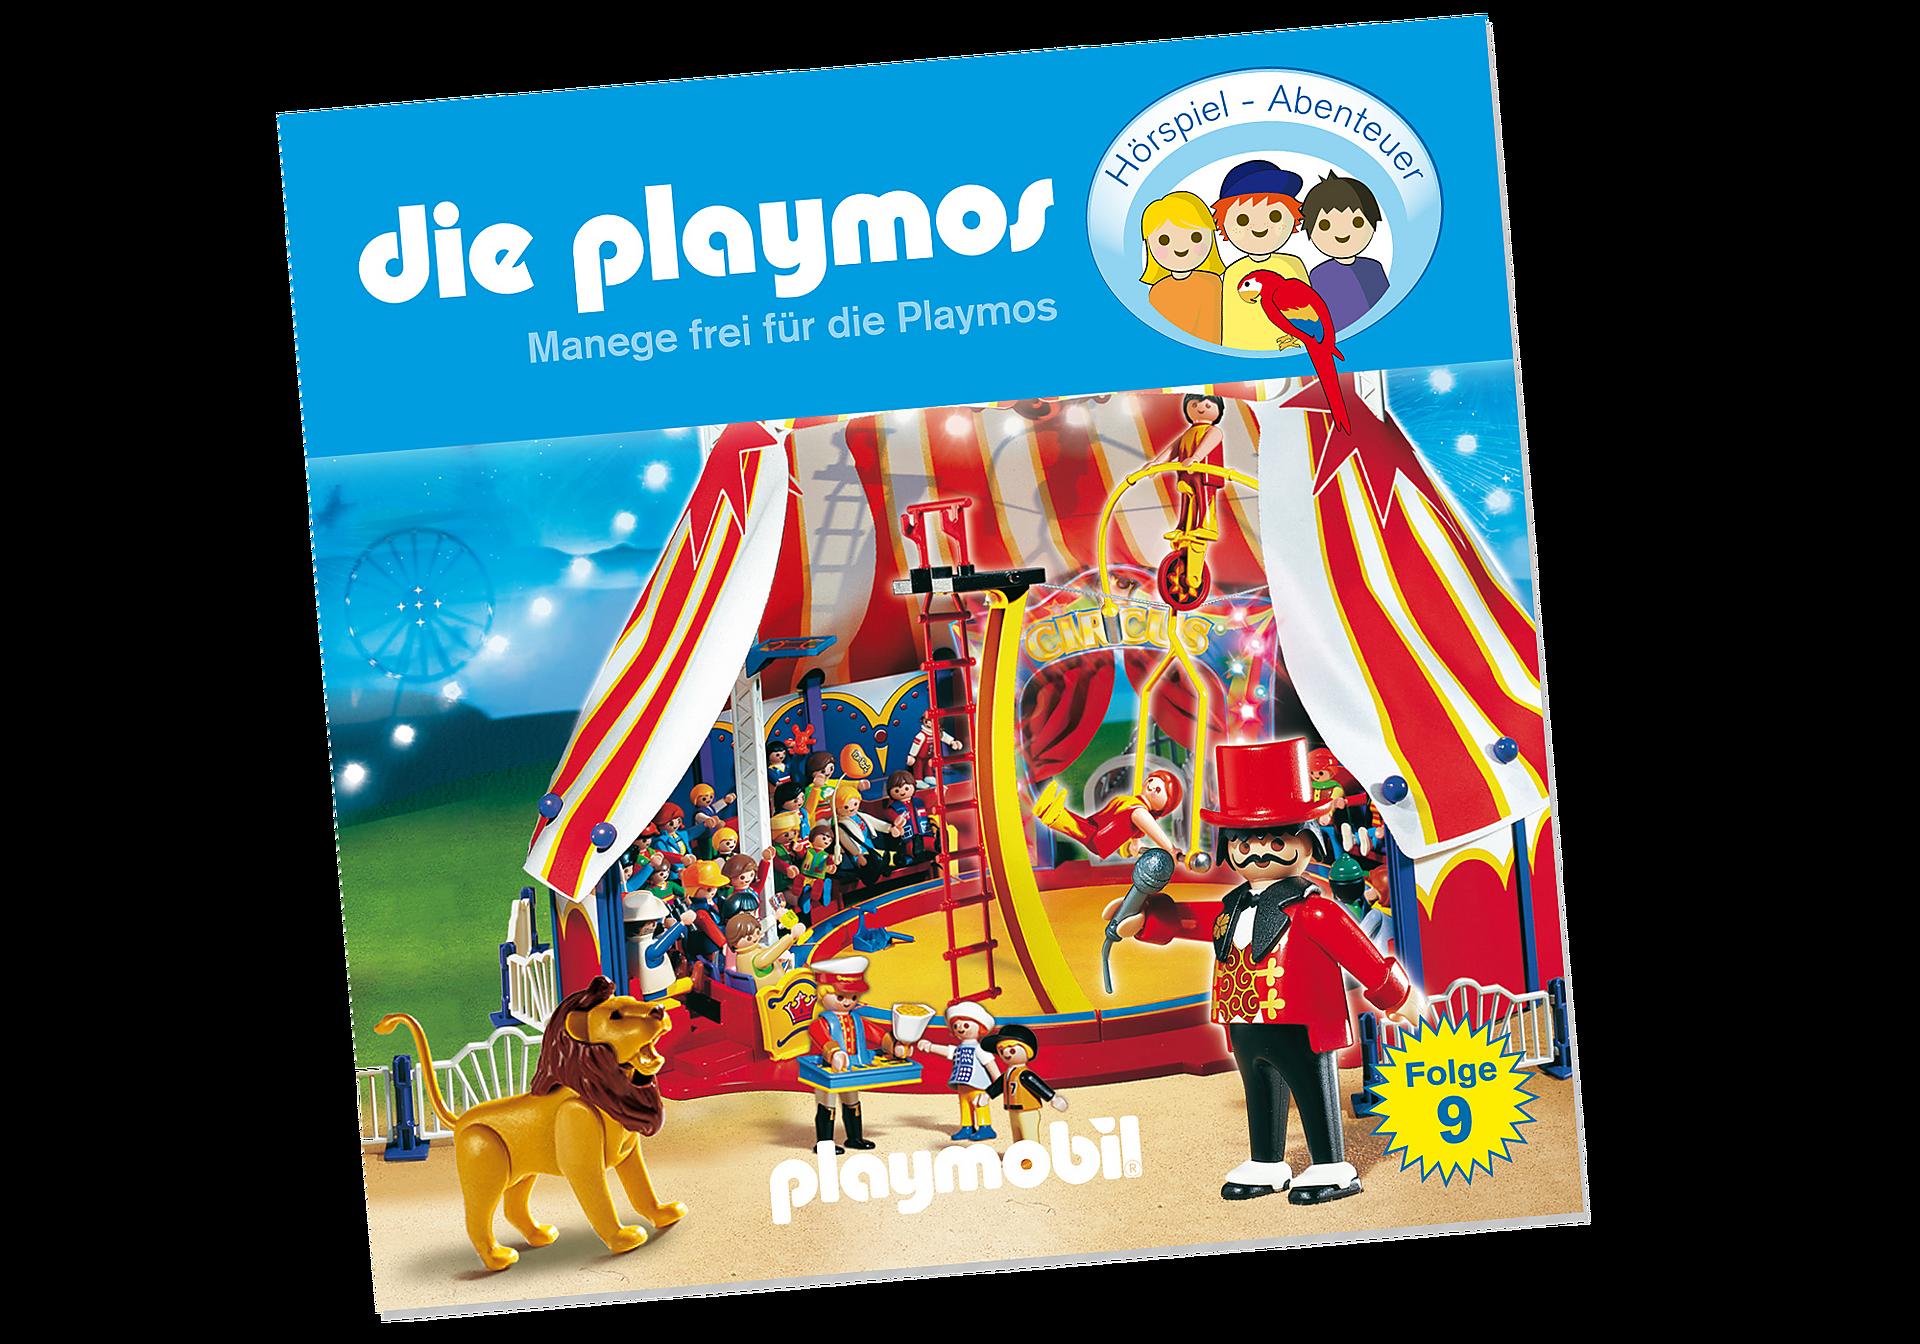 http://media.playmobil.com/i/playmobil/80186_product_detail/Manege frei für die Playmos (9) - CD